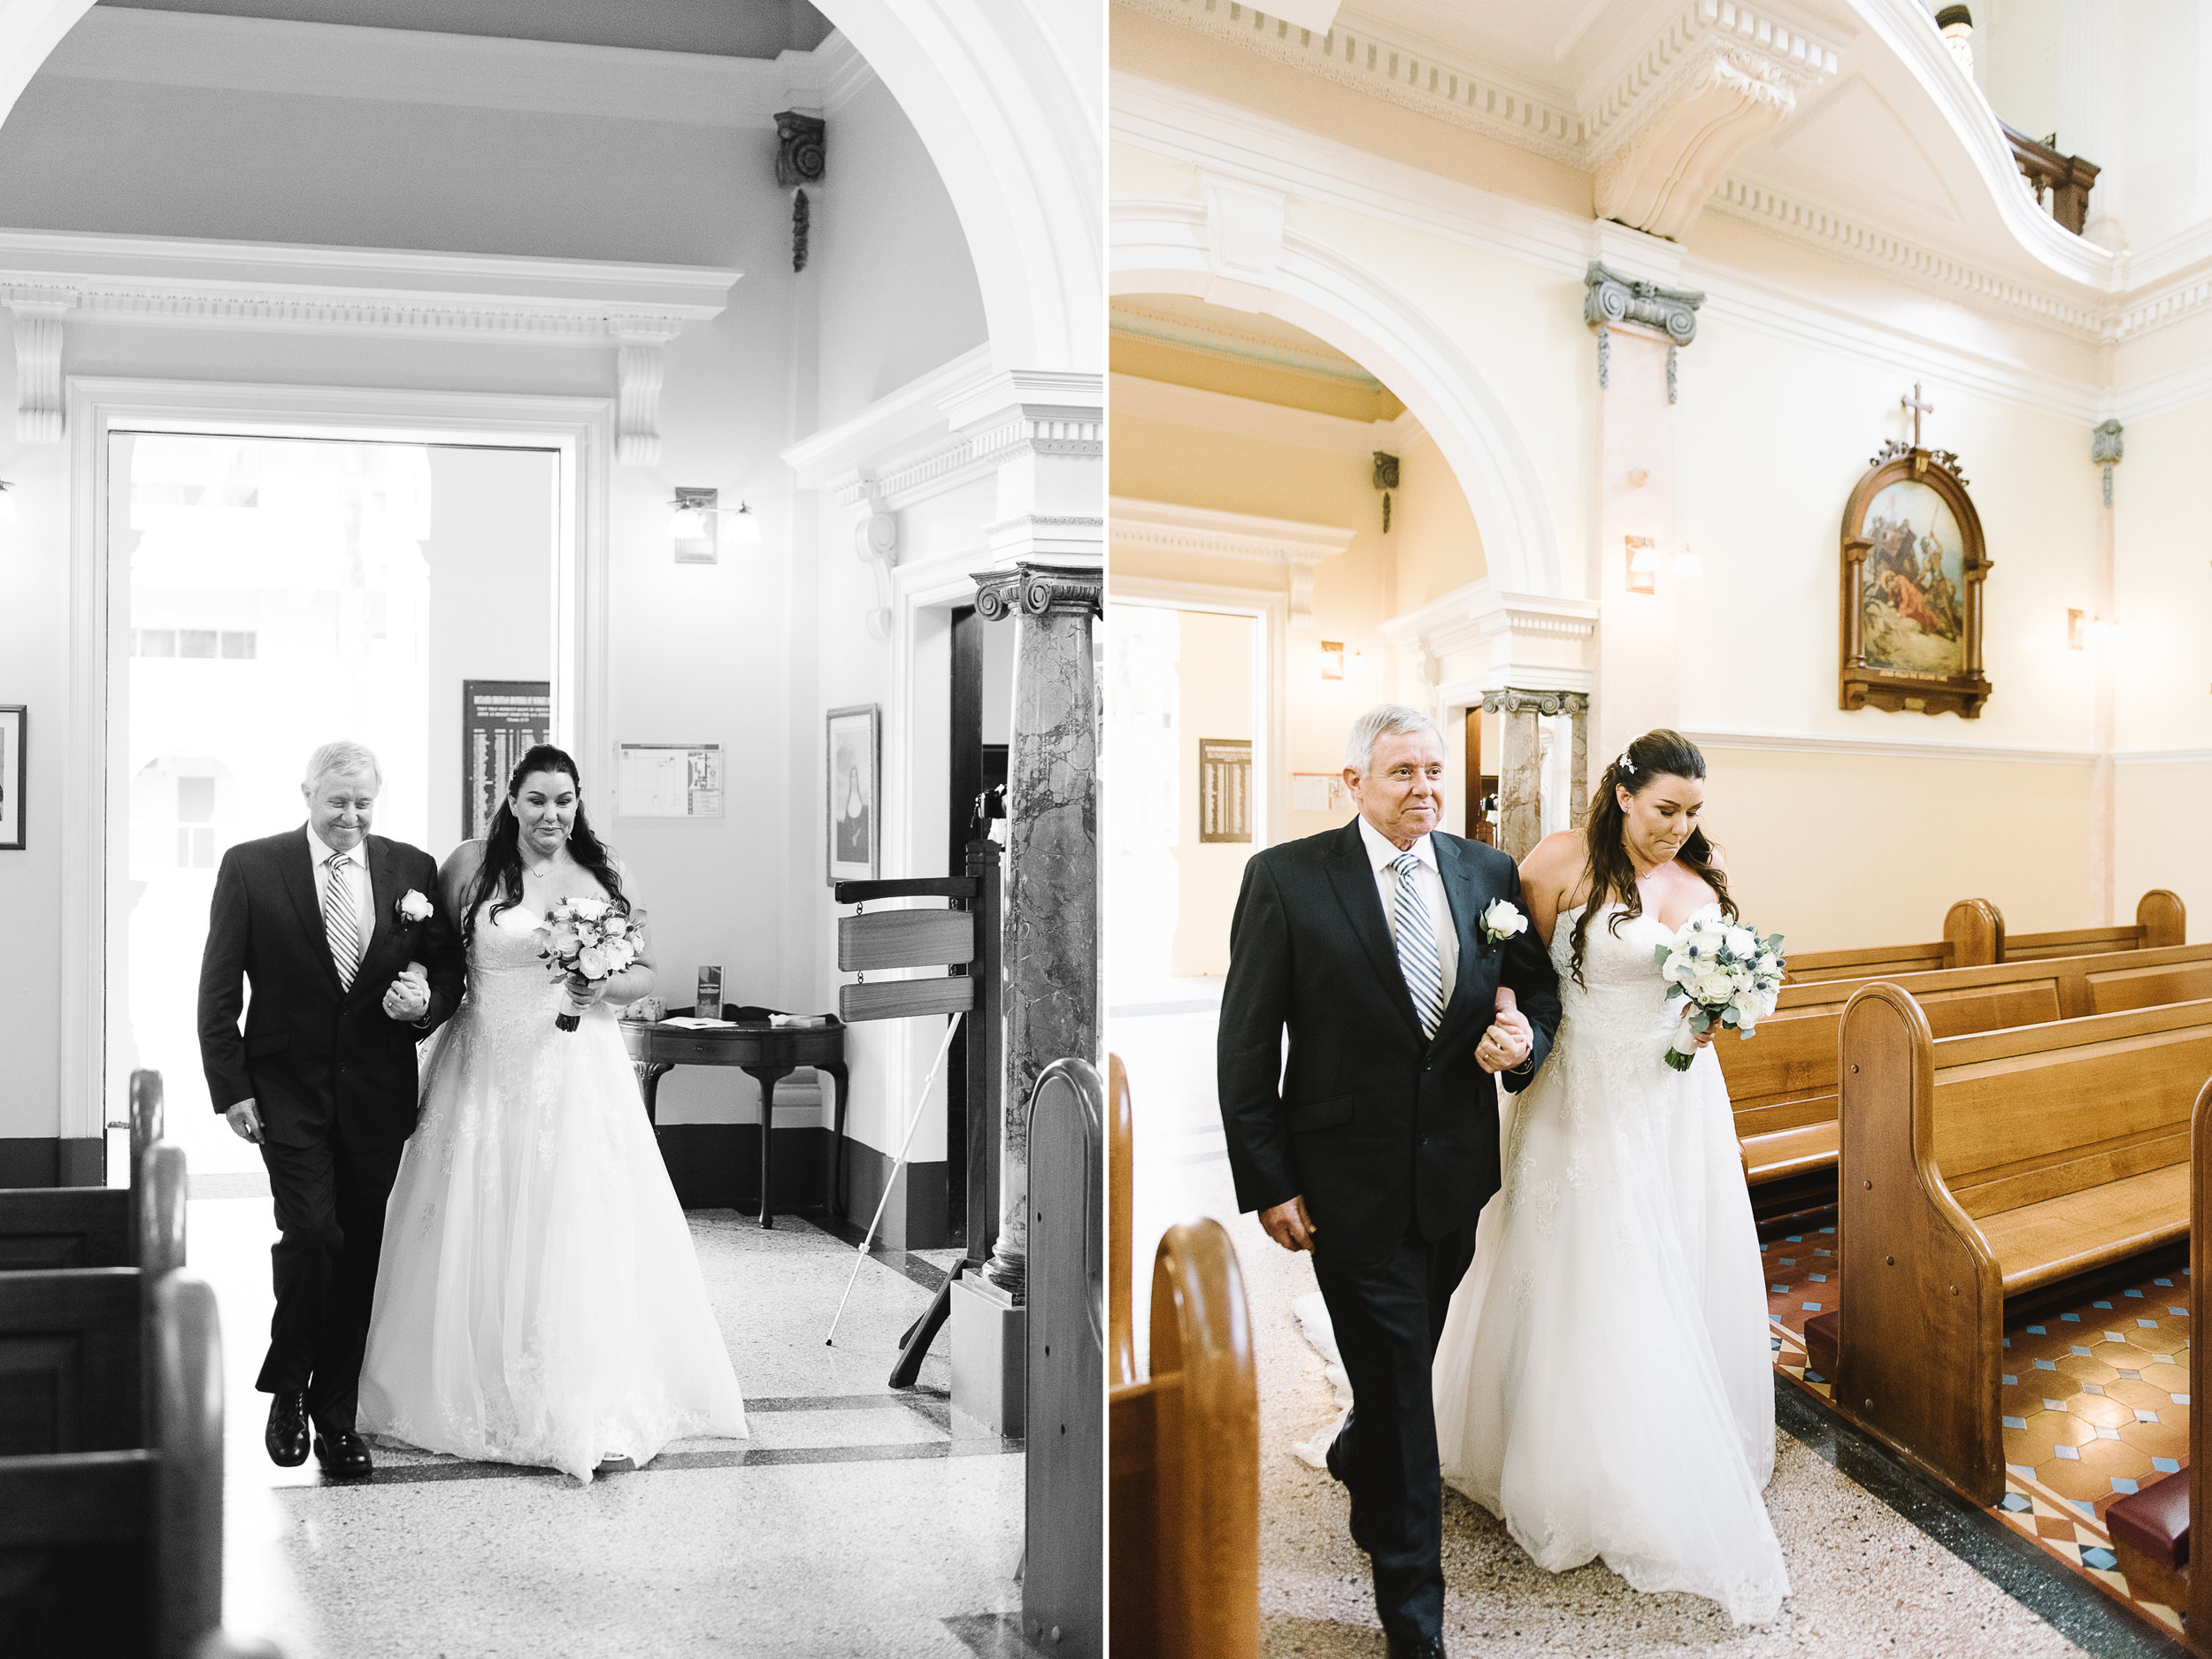 nudgee-college-wedding-18.jpg